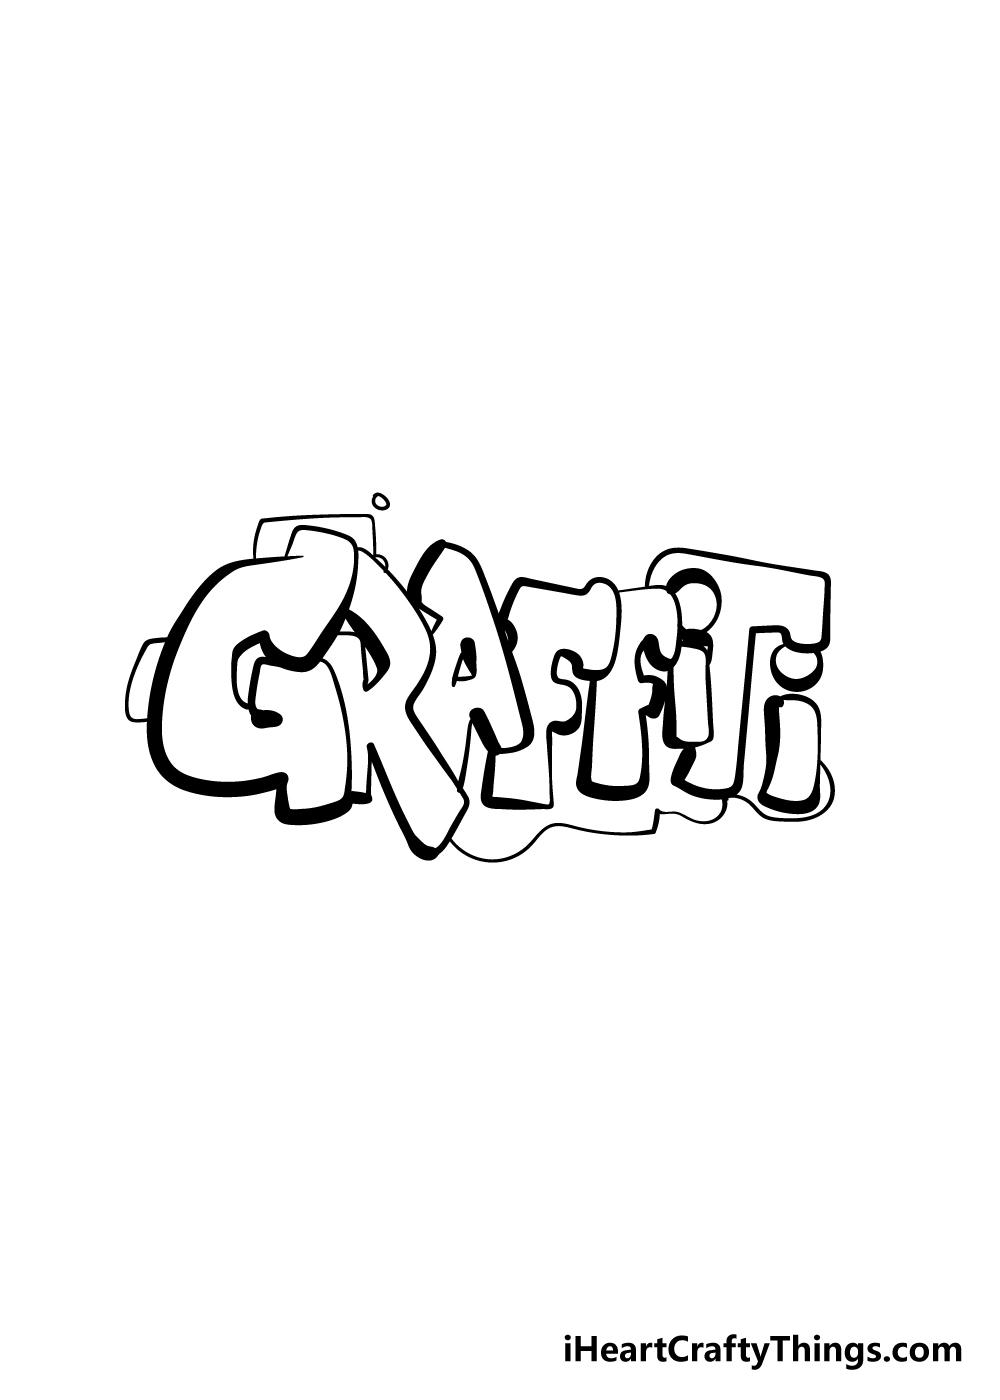 graffiti drawing step 9